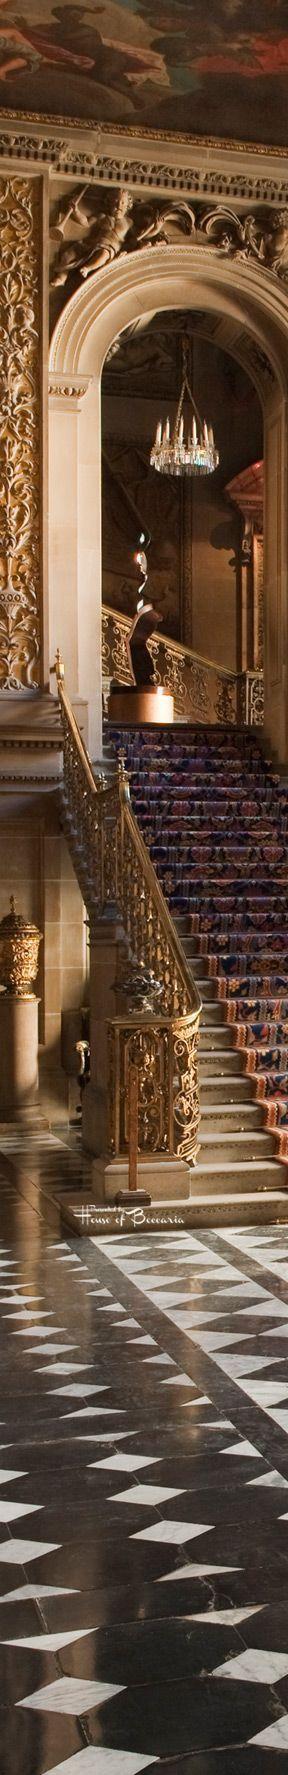 ~Chatsworth Estate, Debyshire, England location of Devonshire Manuscript | House of Beccaria#